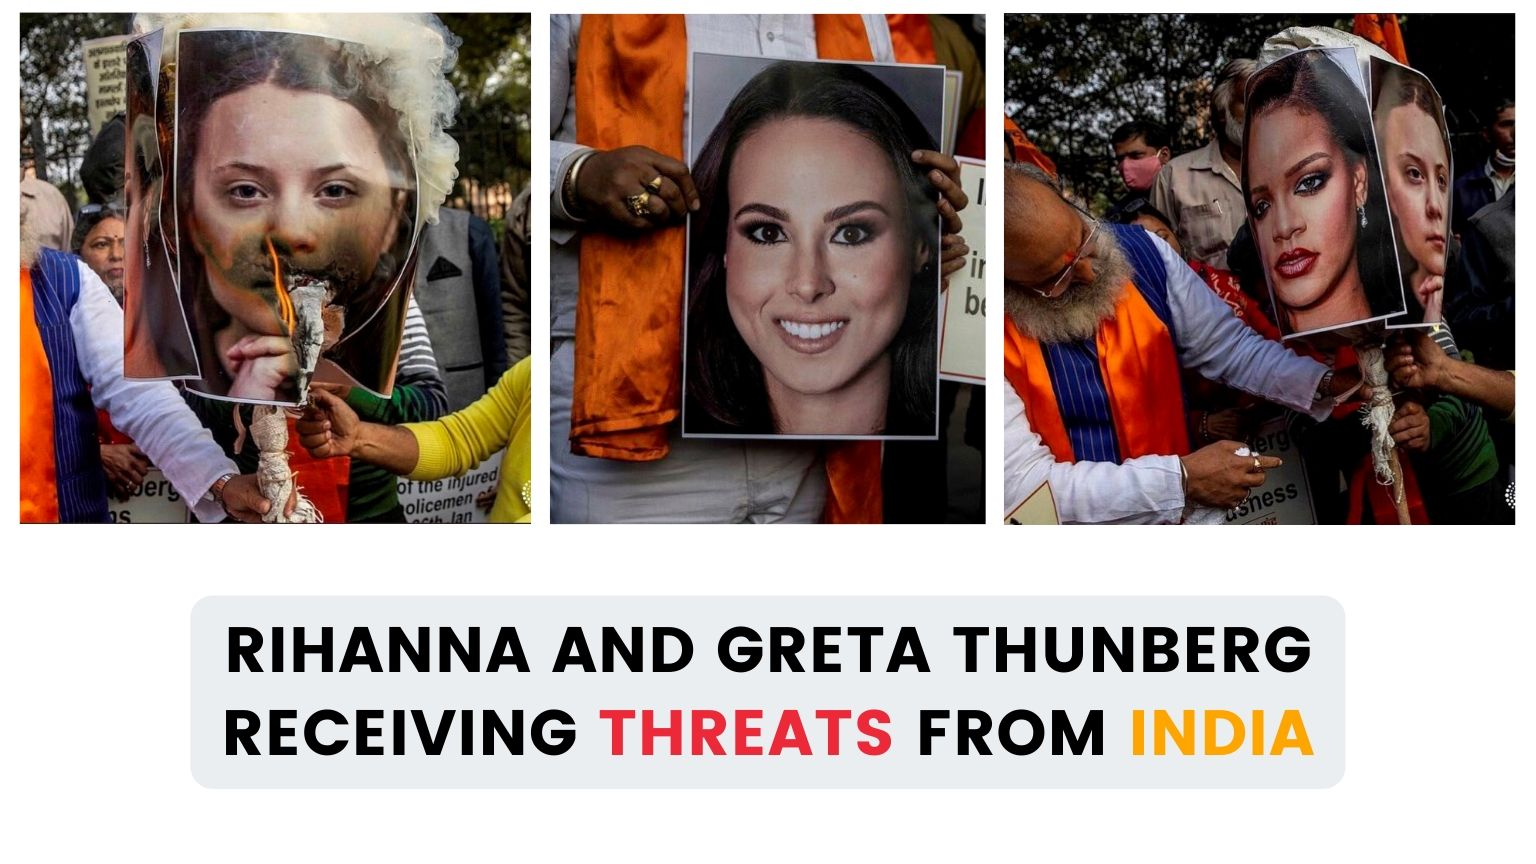 Why Rihanna and Greta Thunberg receiving threats from India